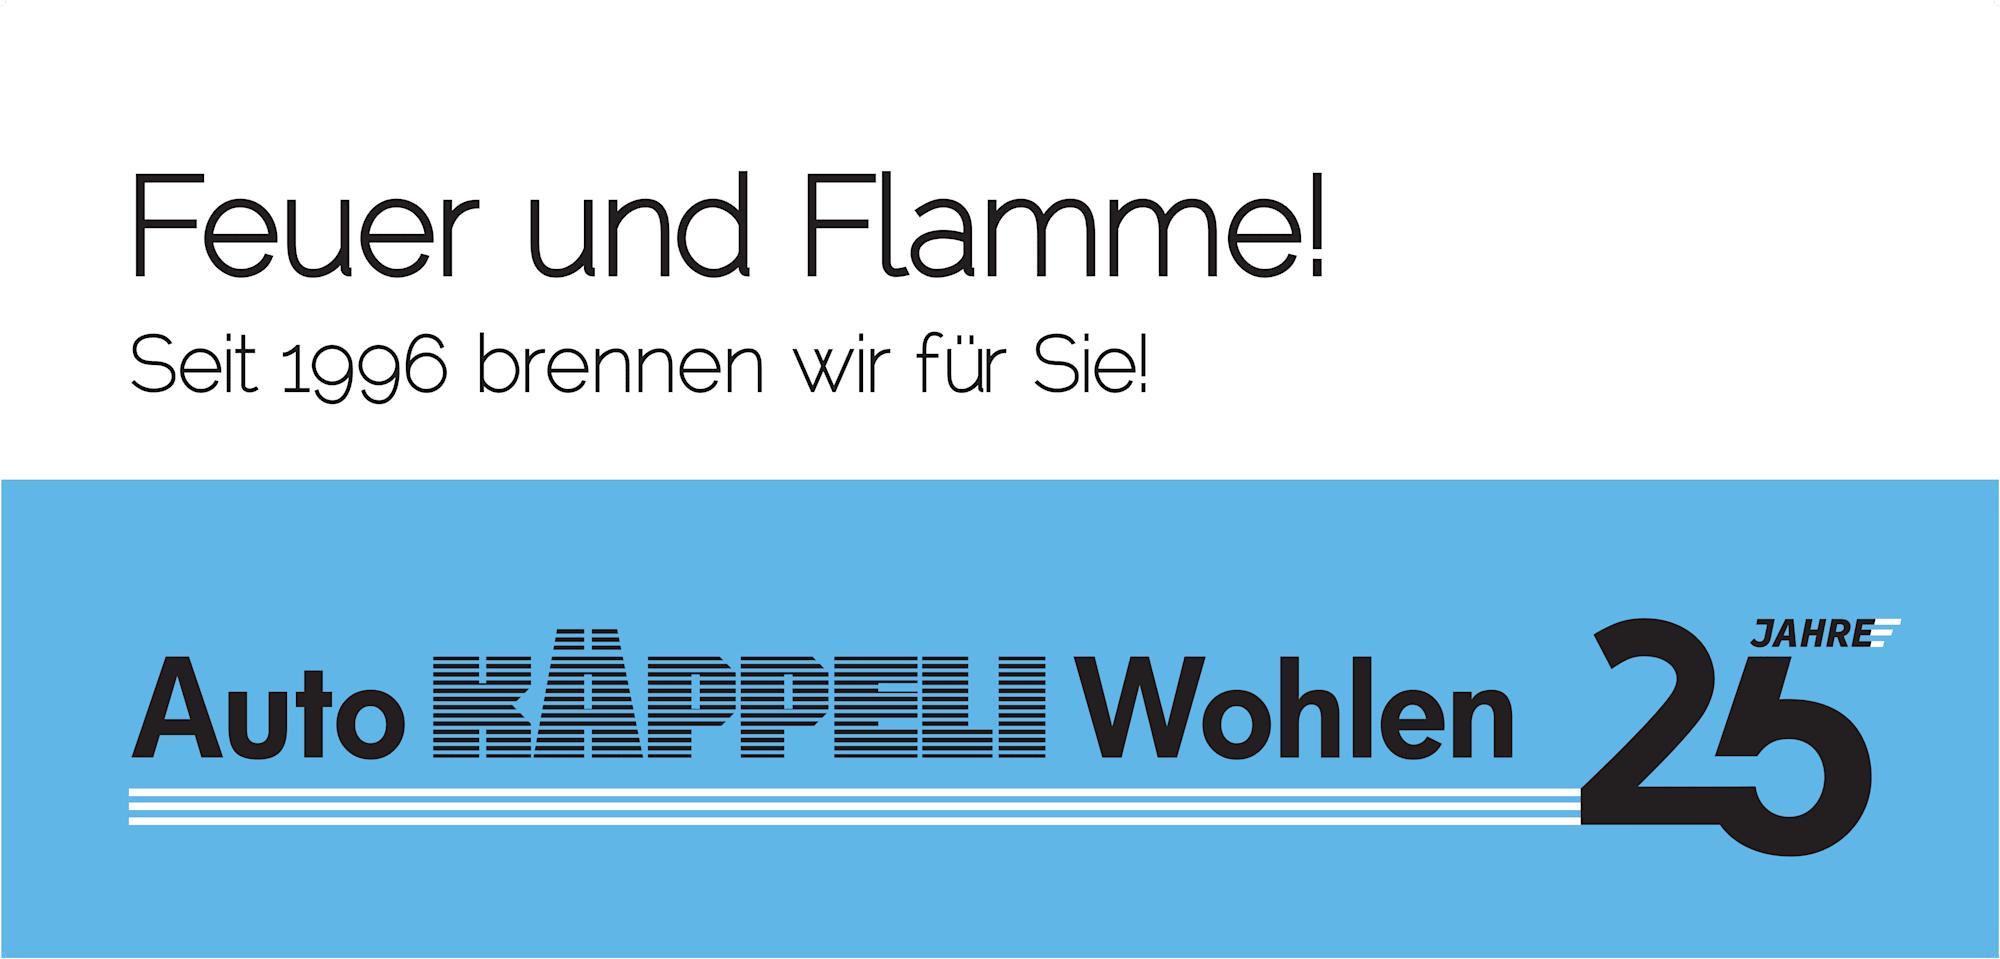 Plakat_F12_25_Jahre_print_Feuer